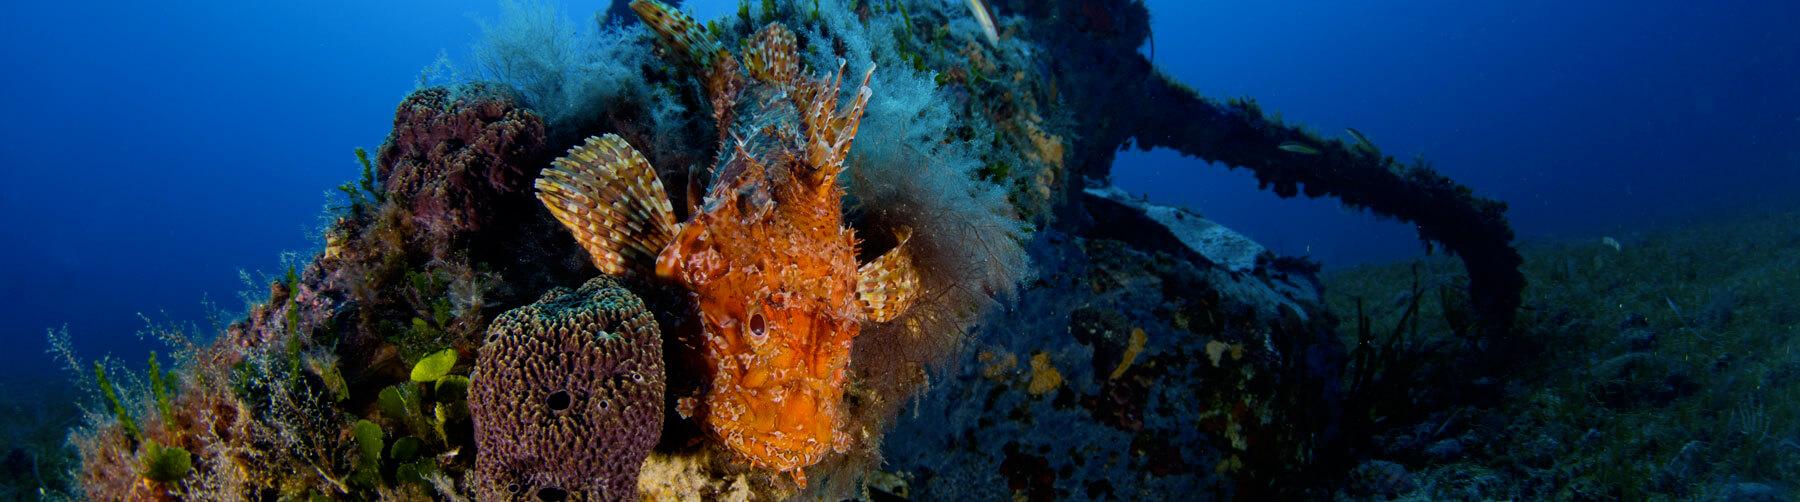 fish plongée en Sardaigne Palau